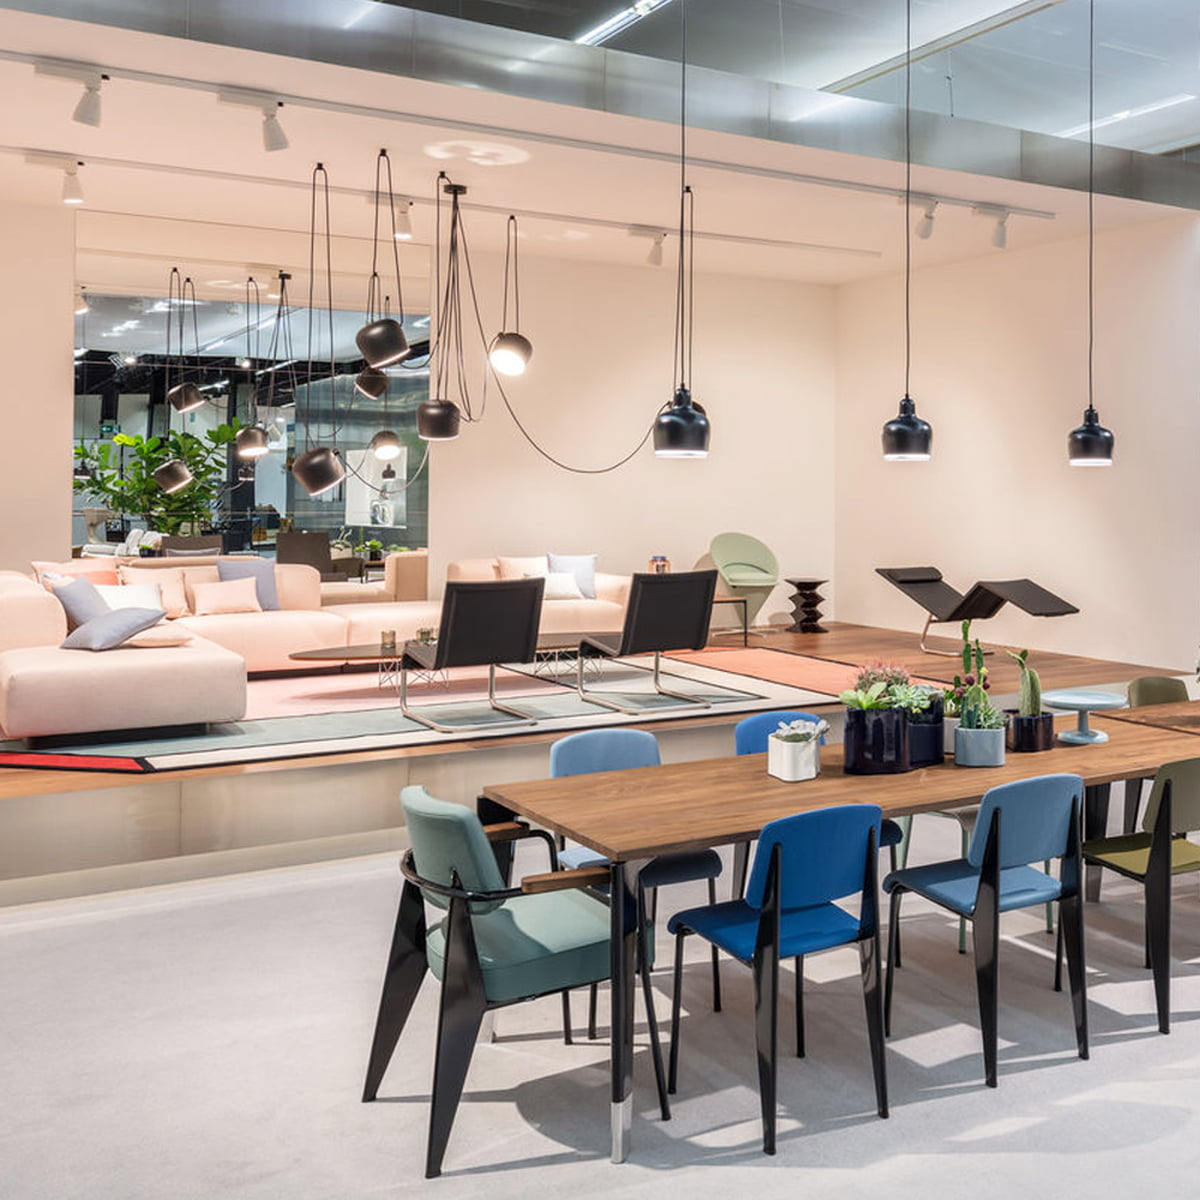 Standard SR Stuhl von Vitra | Connox Shop